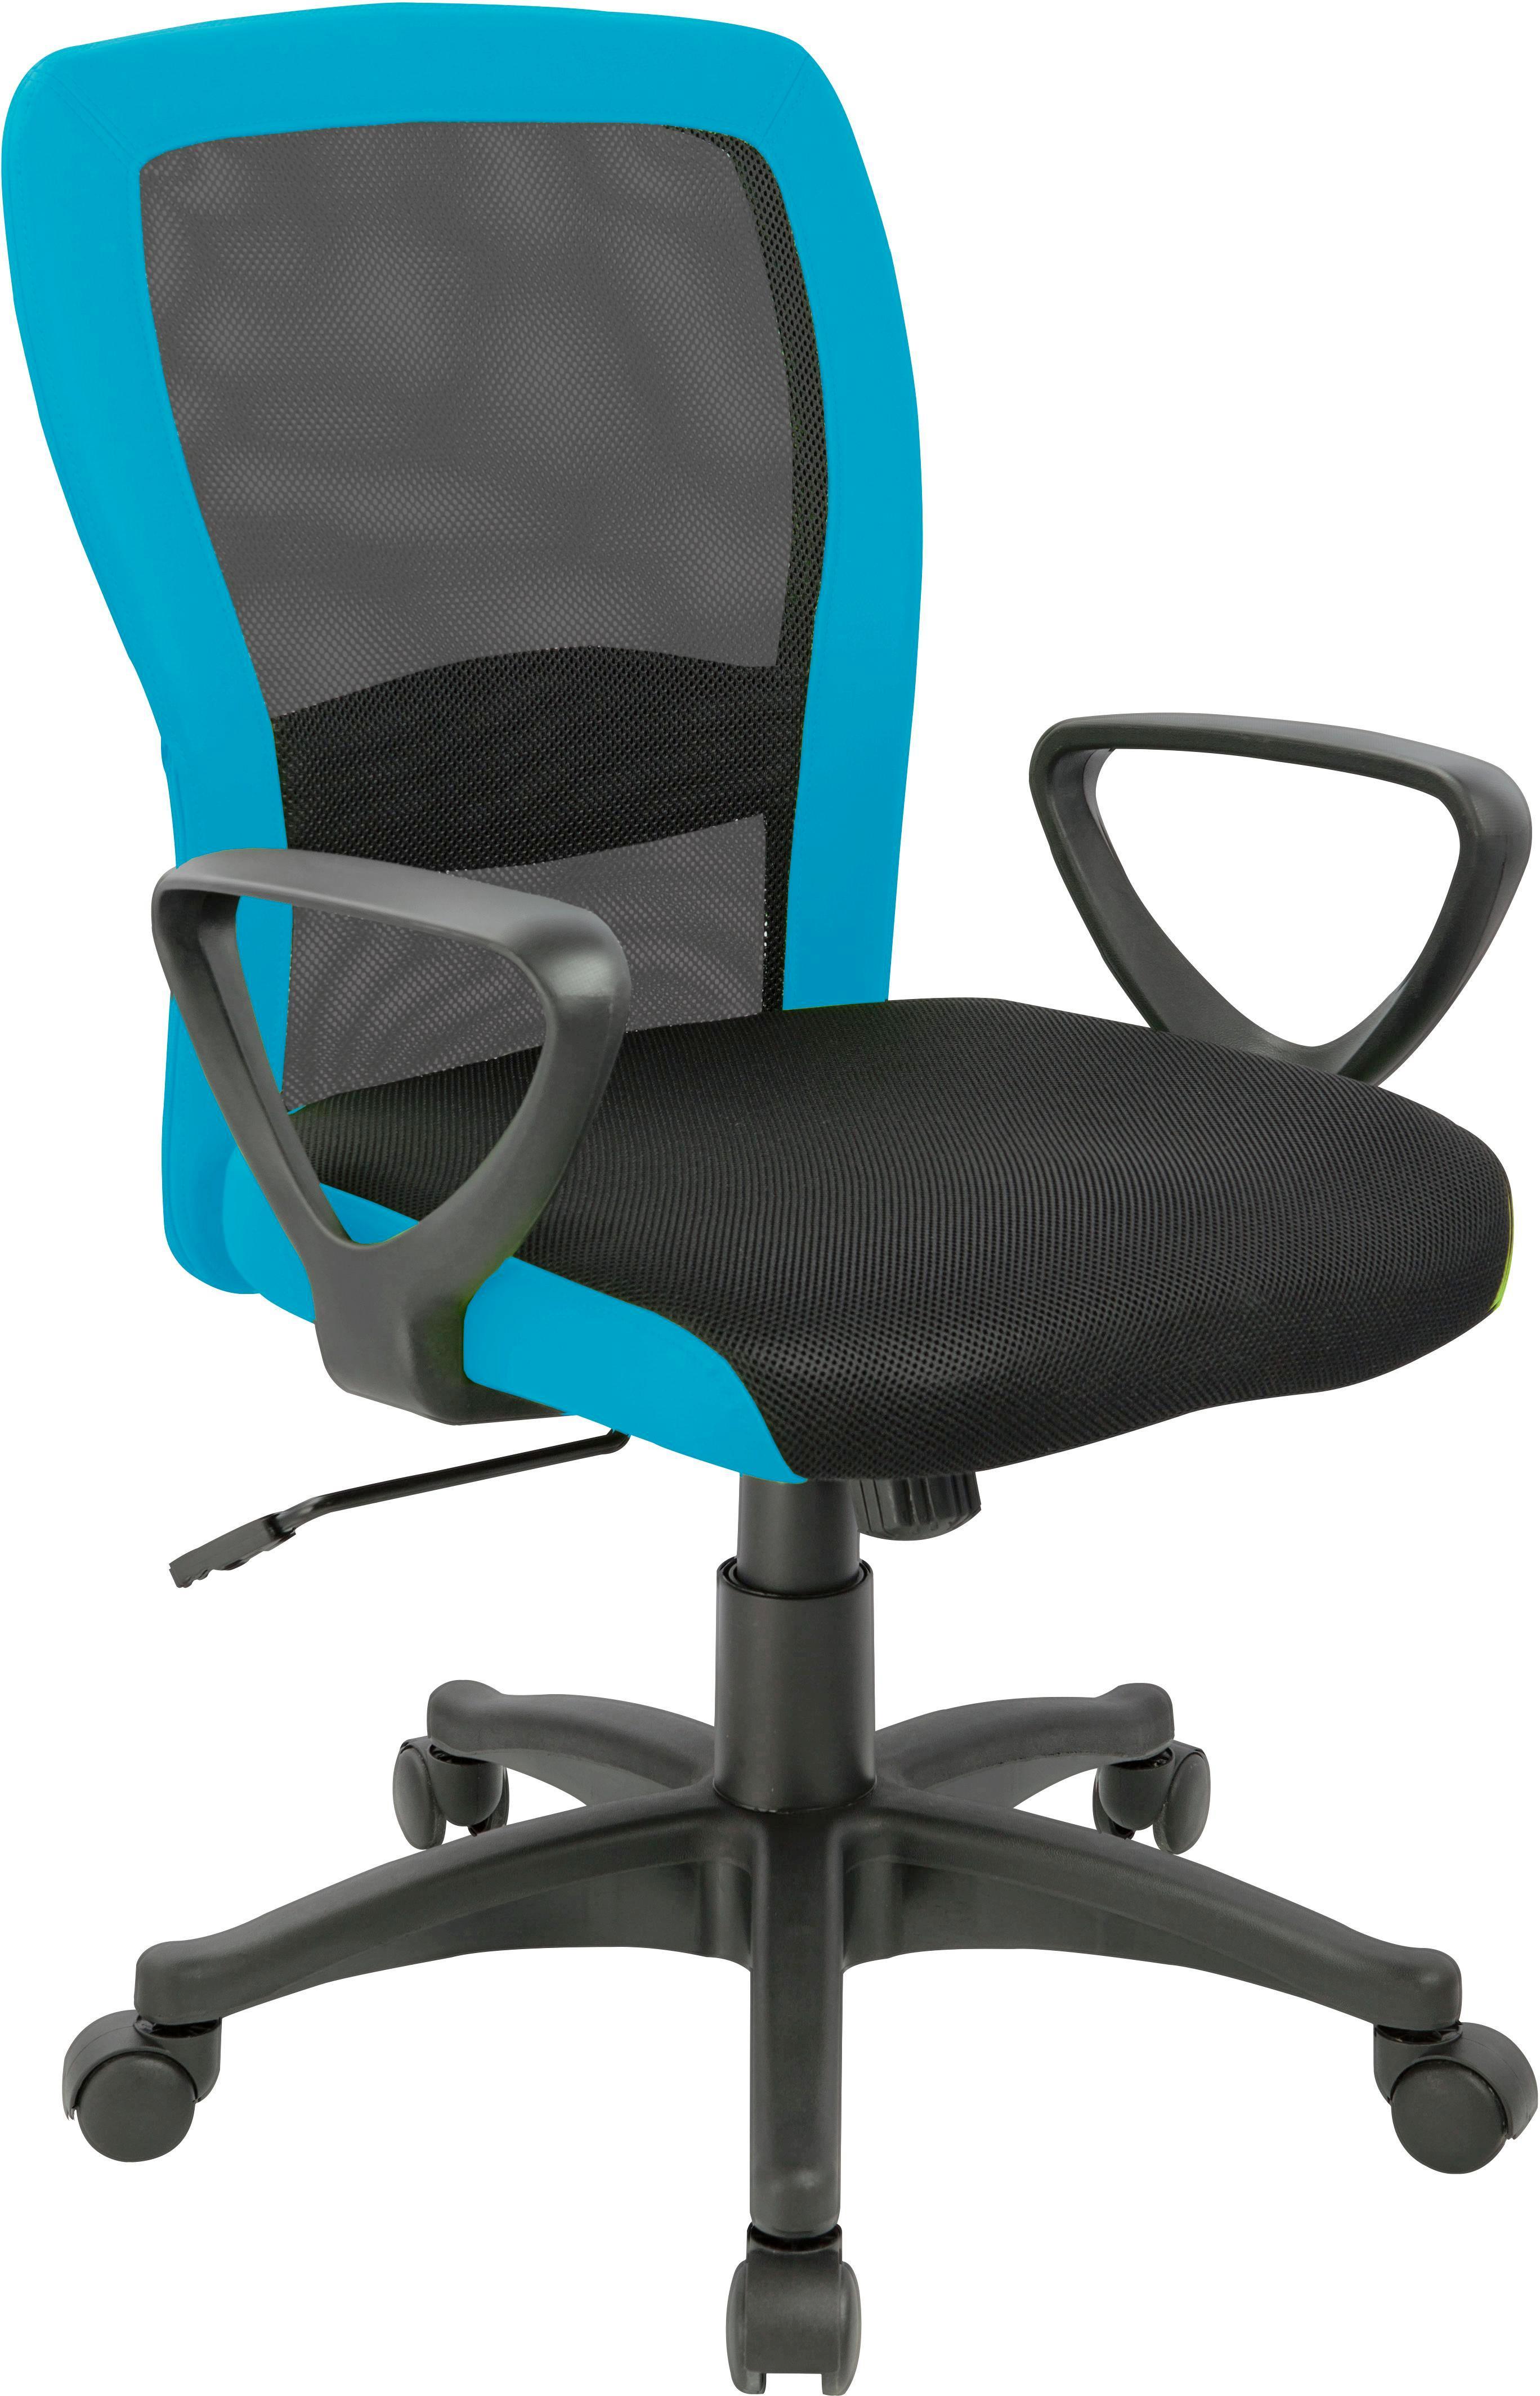 Otočná Židle Petra - petrolej/černá, Moderní, kov/textil (60/91/98,5/57cm)